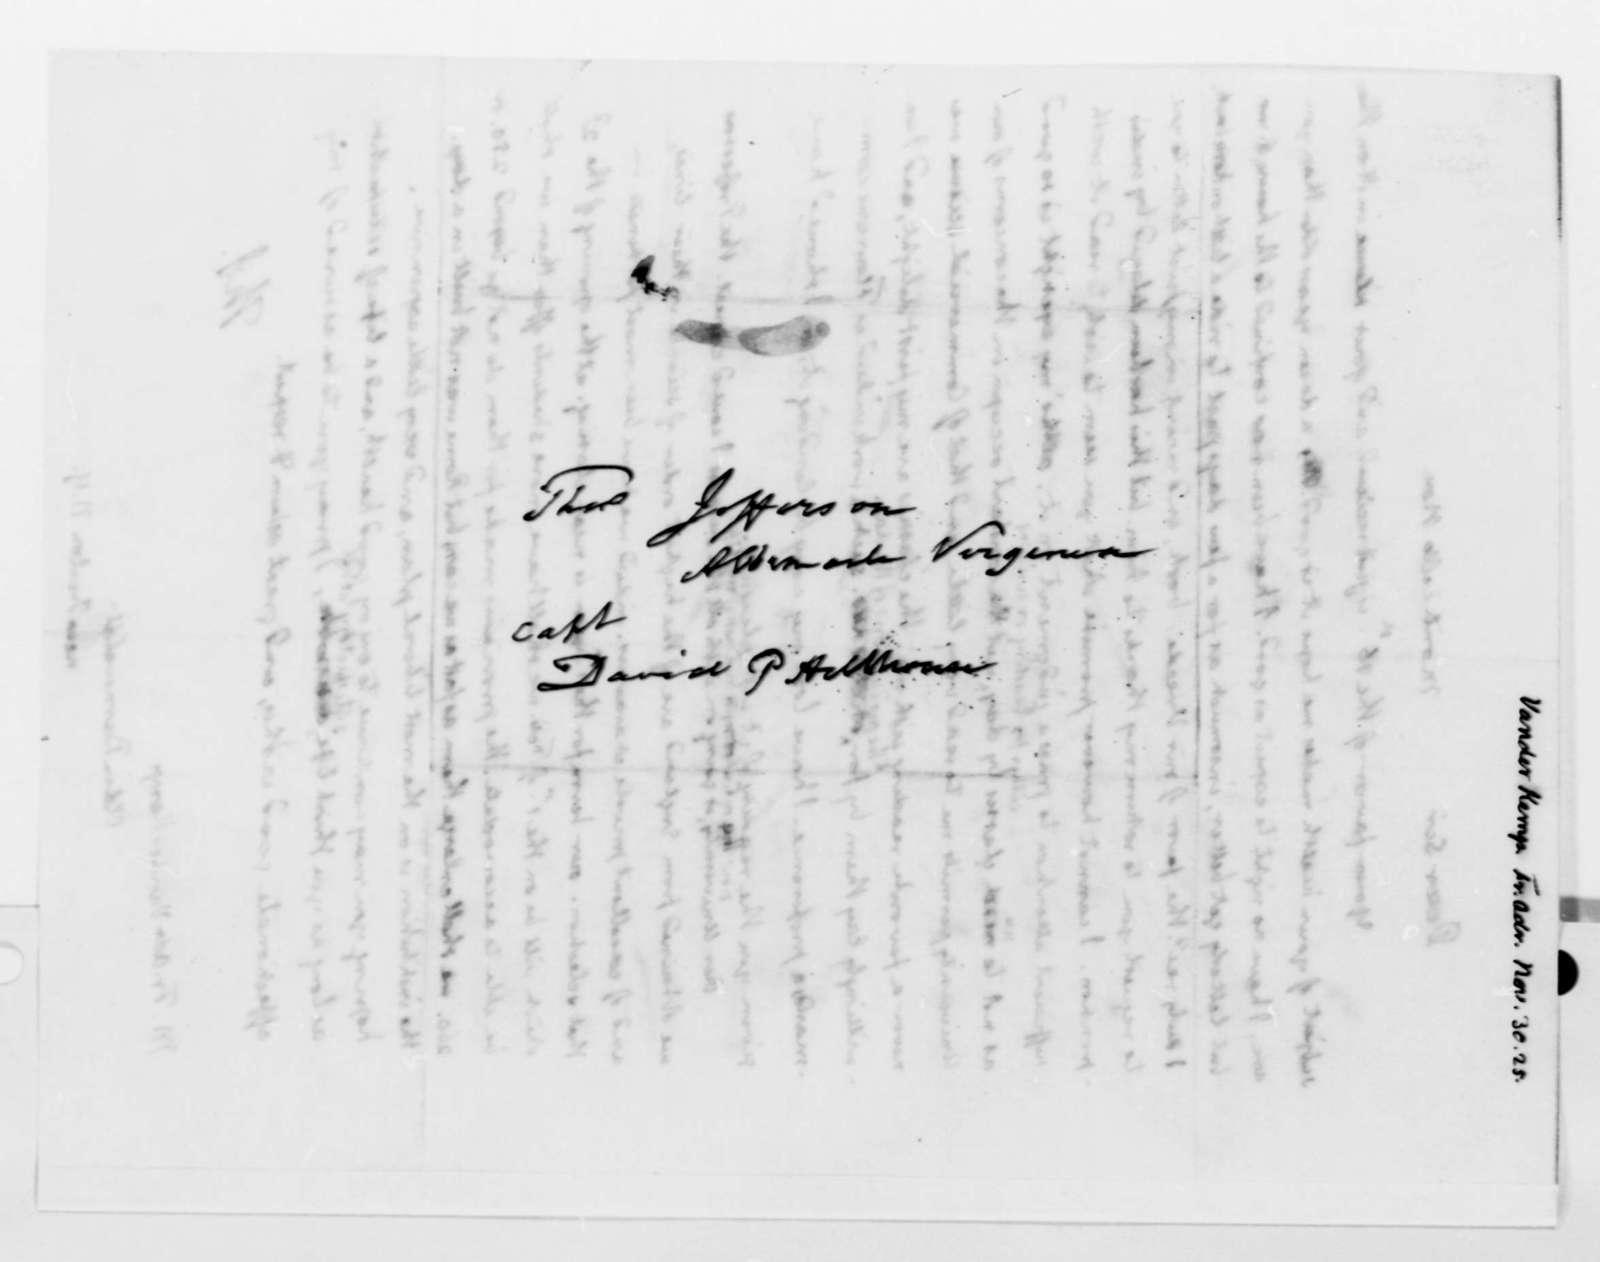 Thomas Jefferson to Francis A. van der Kemp, November 30, 1825